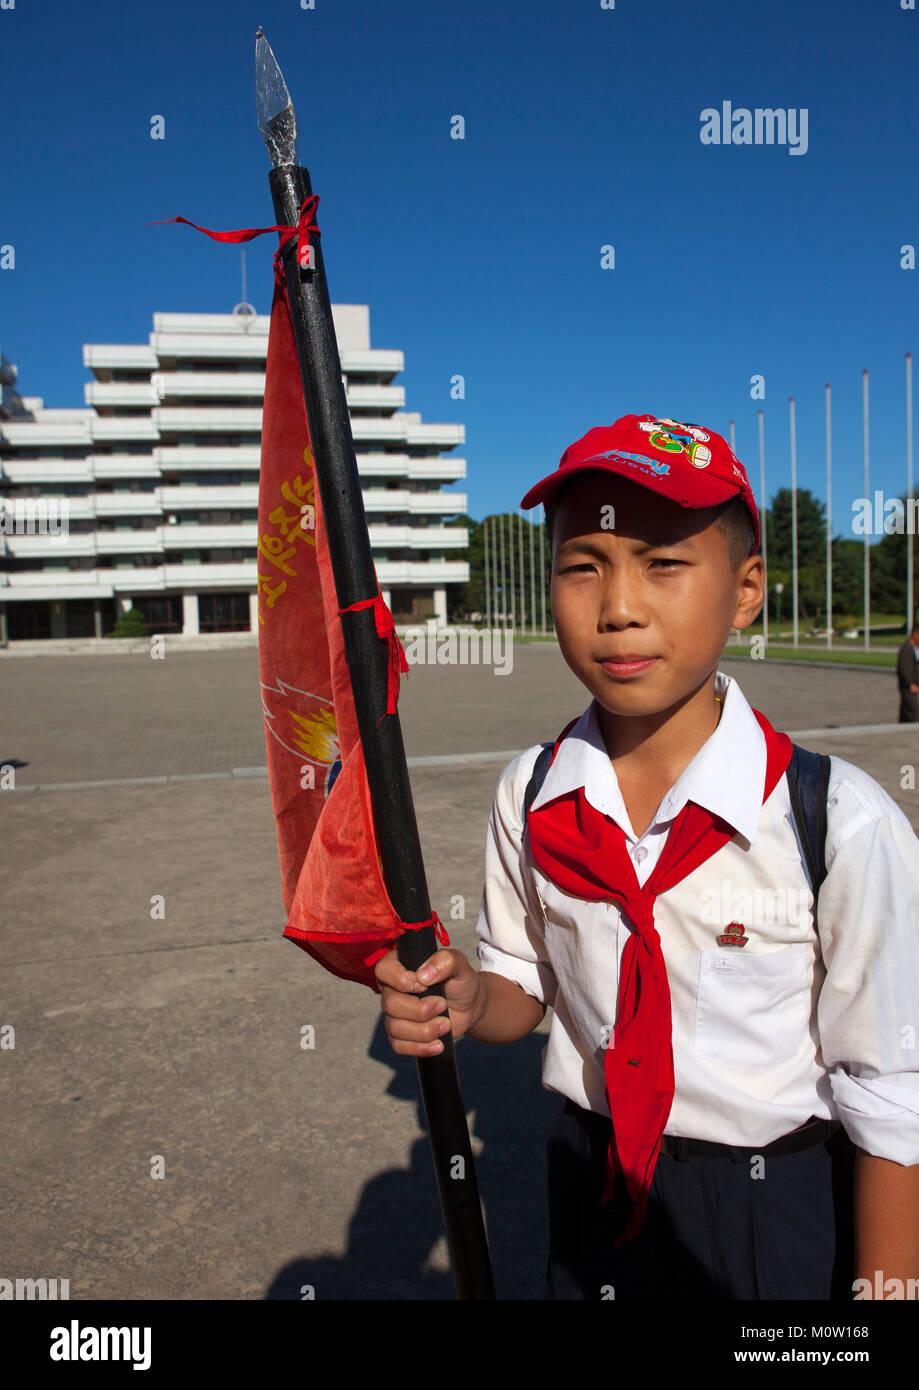 North Korean pioneer holding a flag in Songdowon international children's camp, Kangwon Province, Wonsan, North - Stock Image